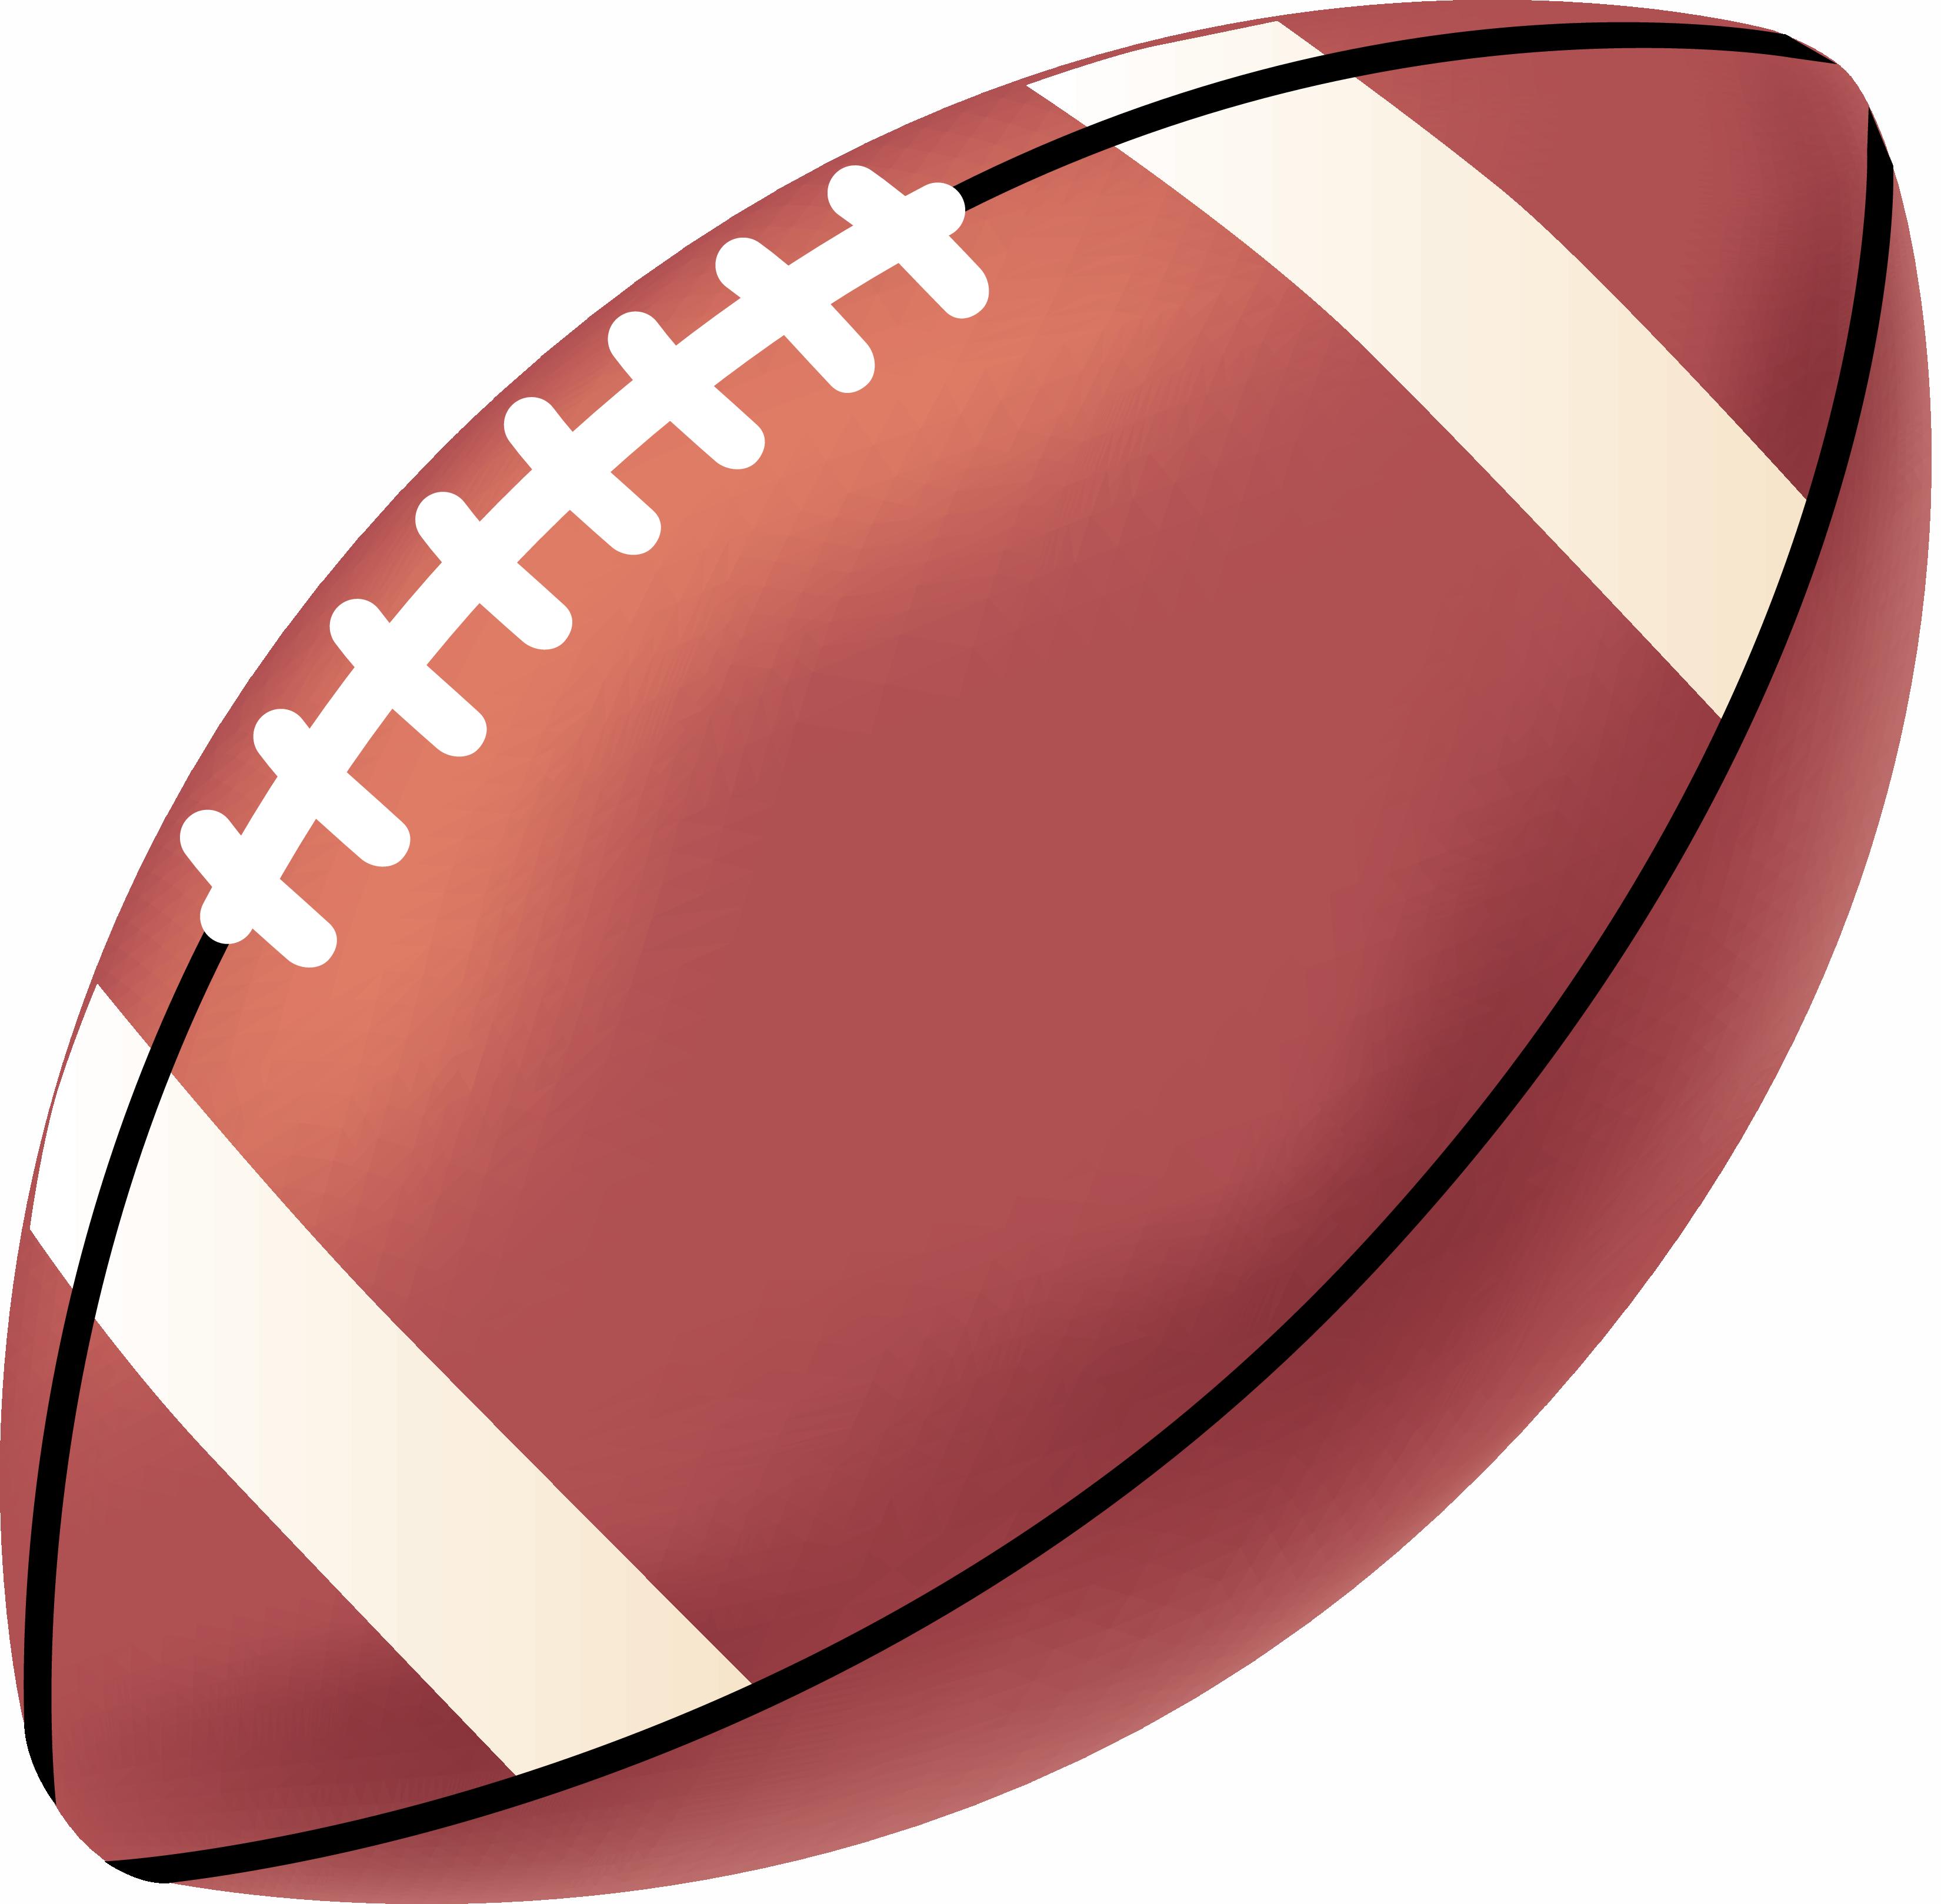 Alabama football clipart vector jpg Free Printable Football Clipart at GetDrawings.com | Free for ... jpg